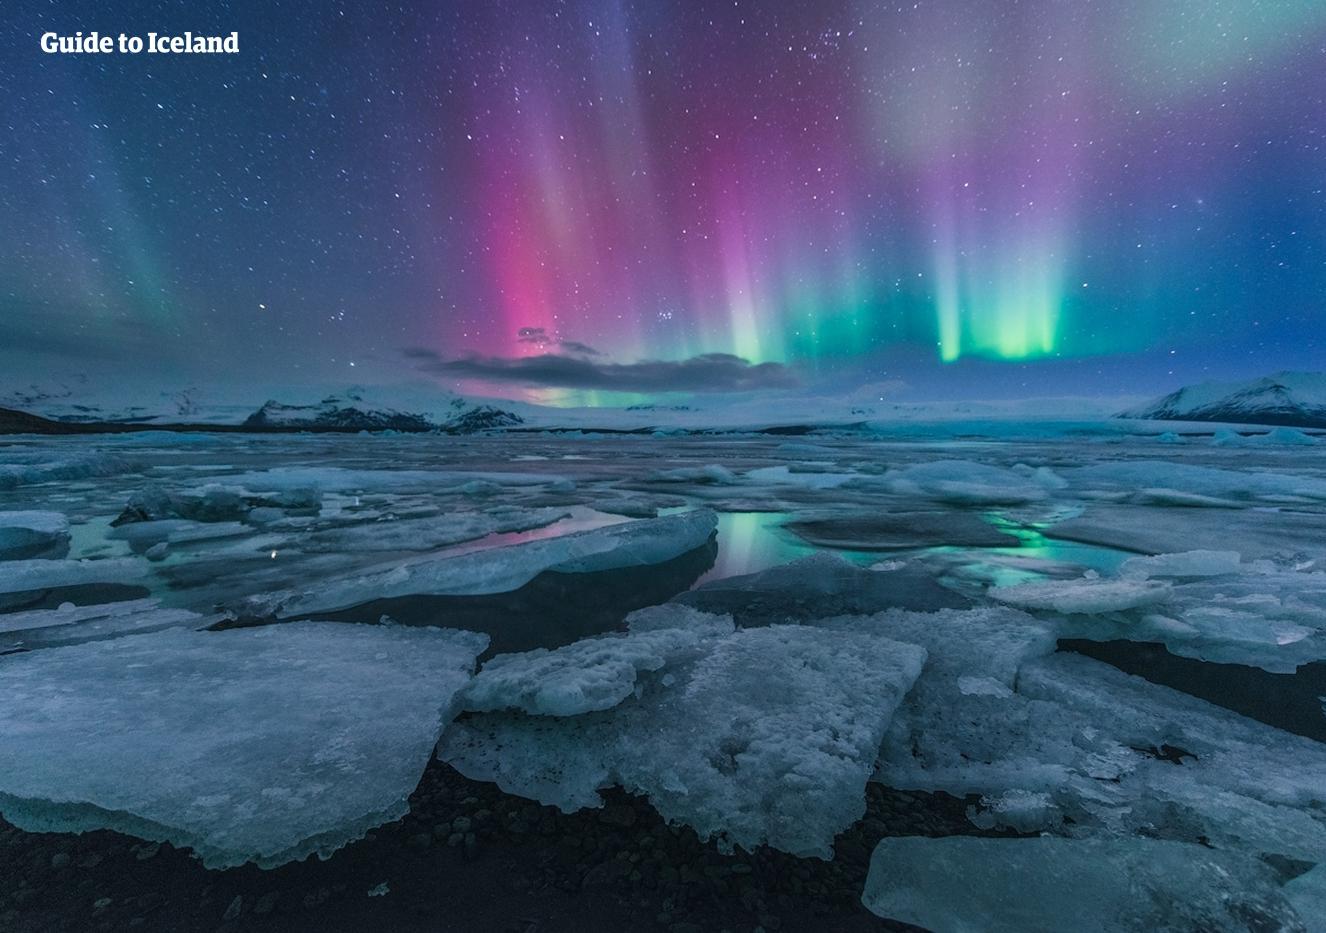 Blått nordlys med lilla nyanser danser over bresjøen Jökulsárlón på Sør-Island om vinteren.